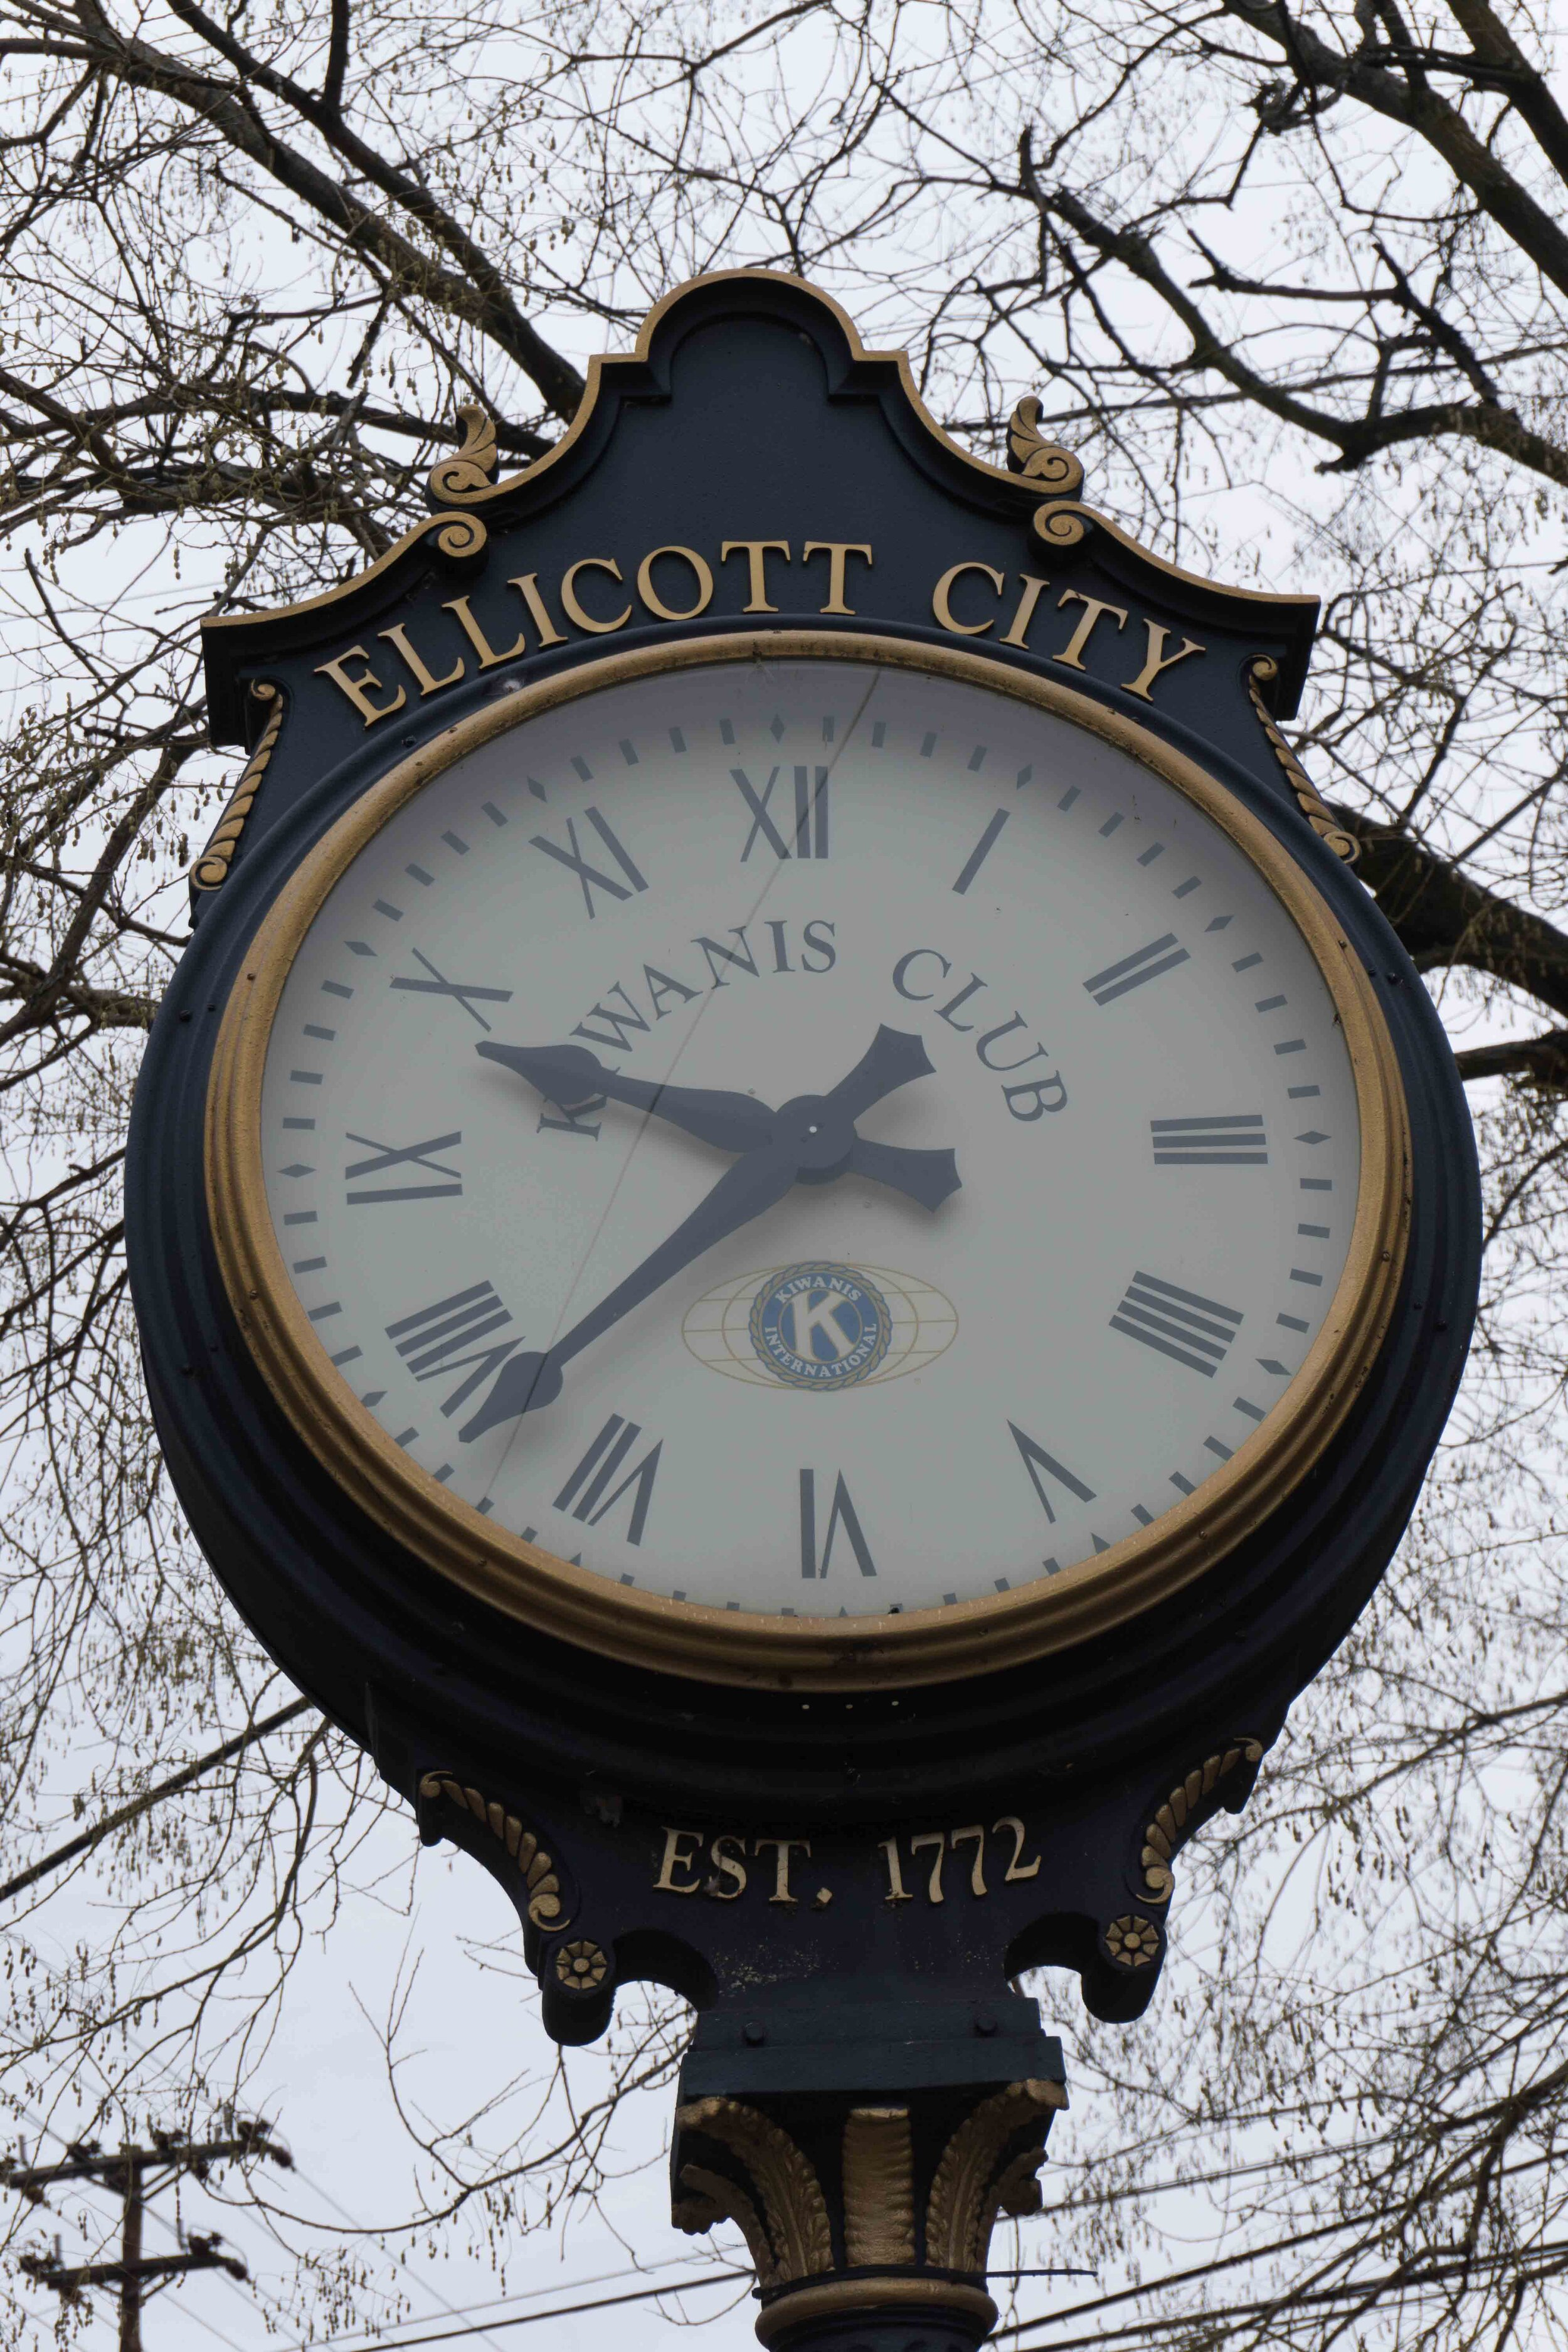 Ellicott City Clock, 12/28/2015